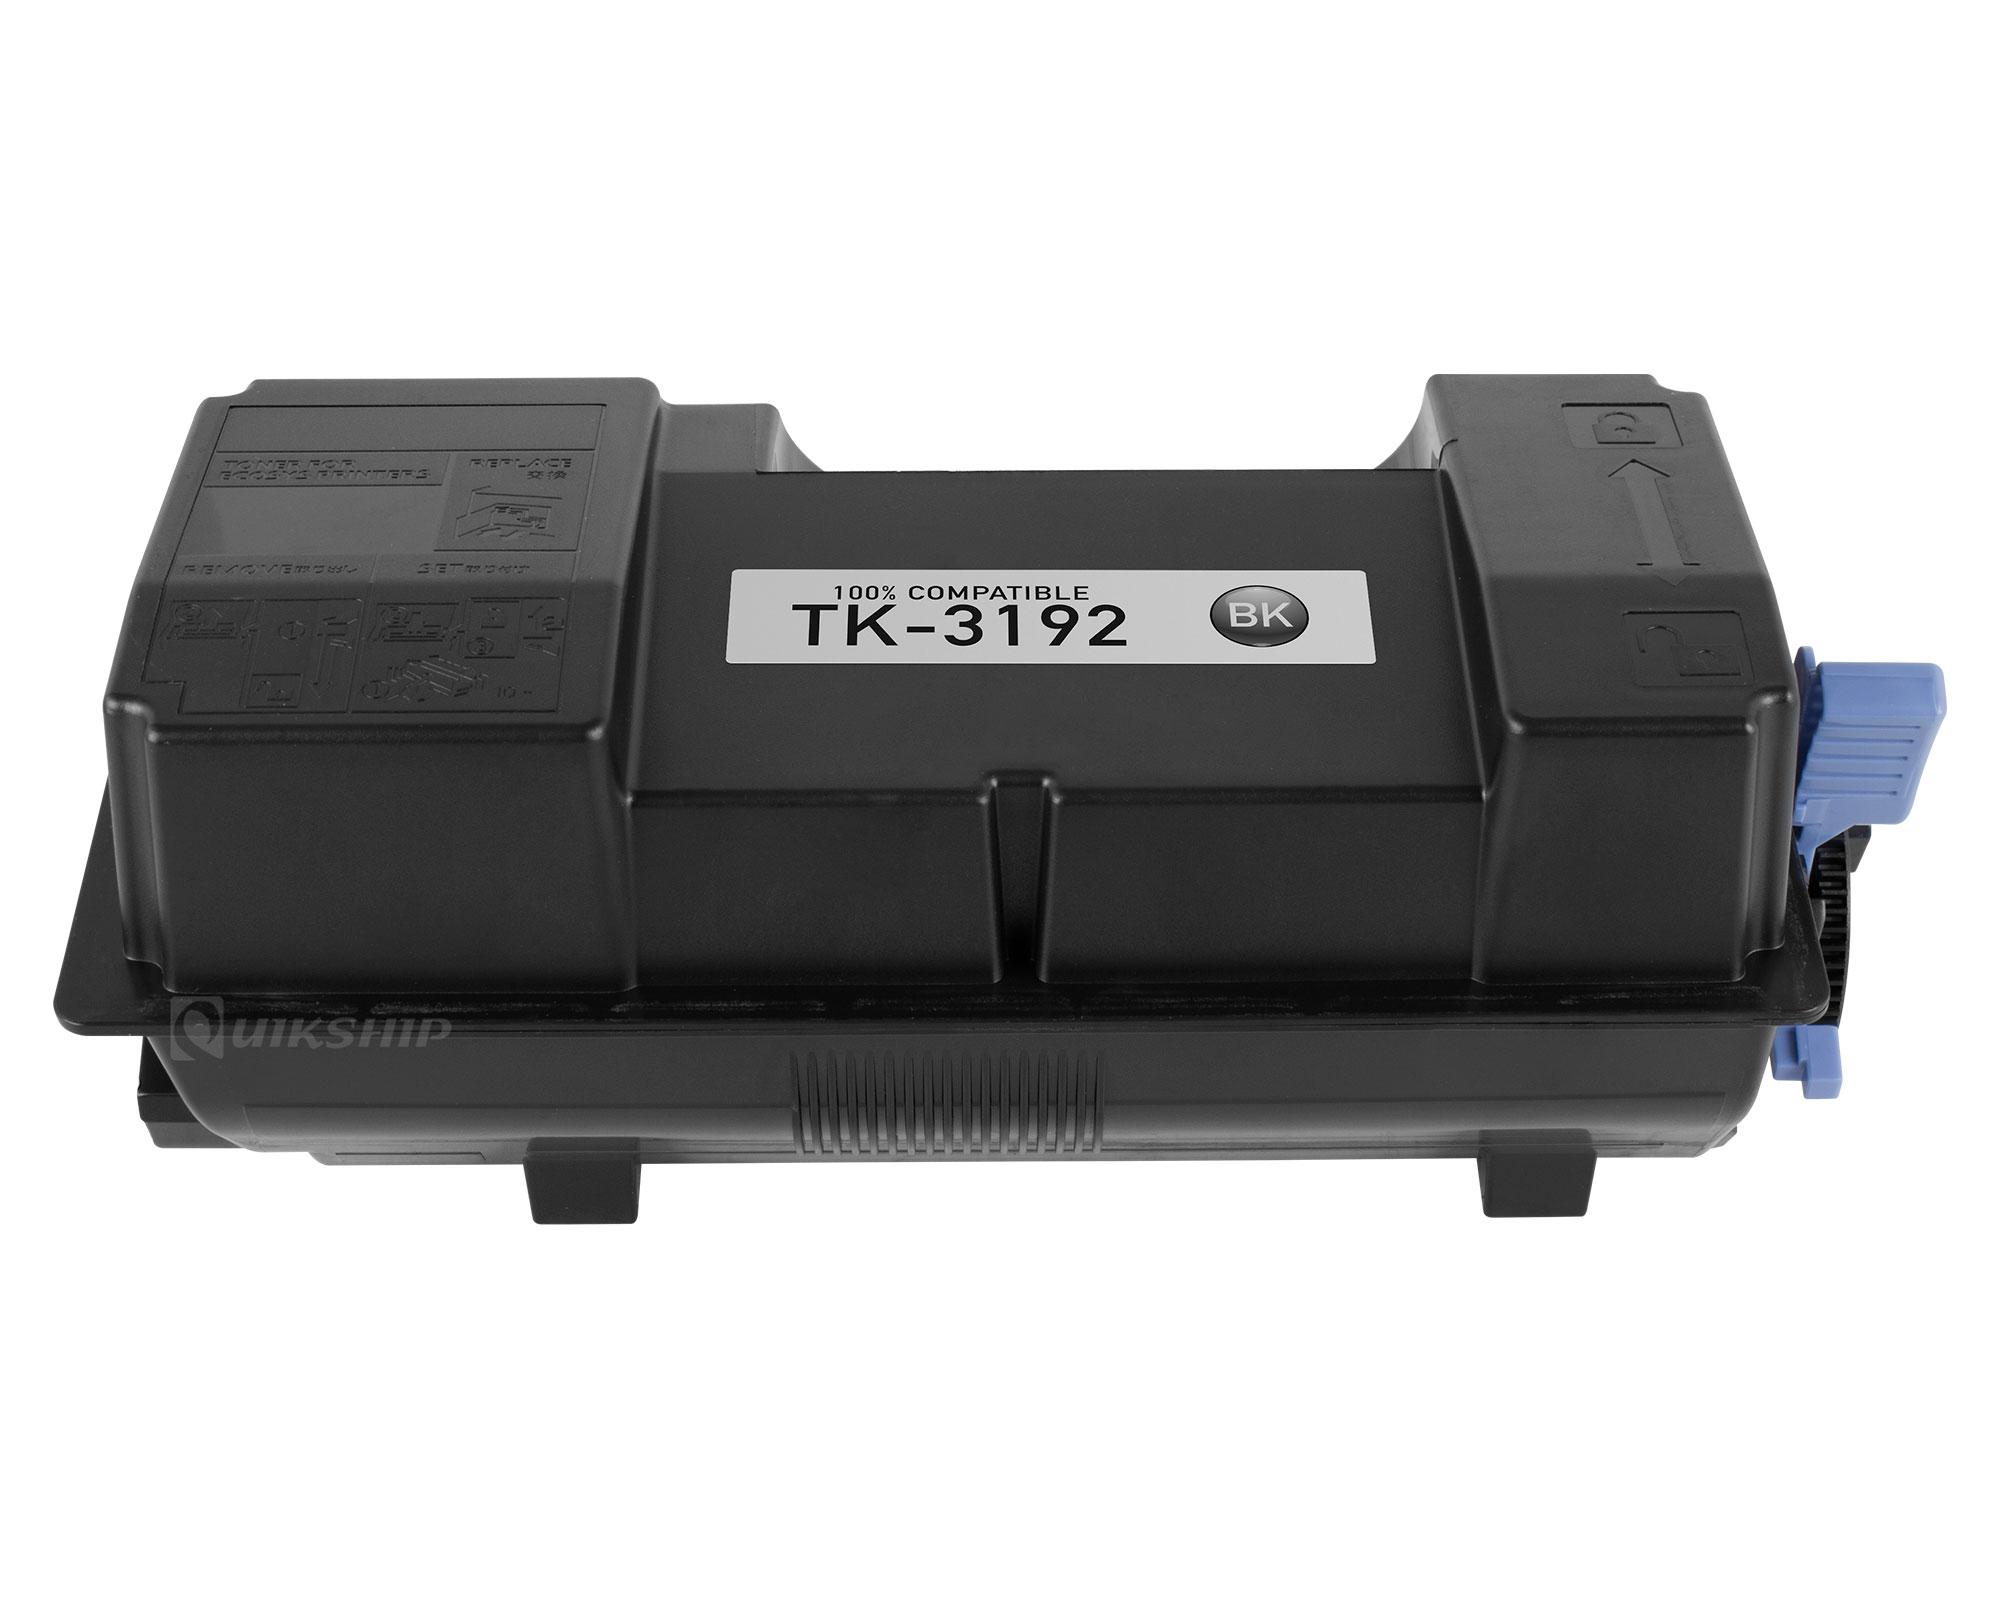 Kyocera Mita ECOSYS P3060dn Toner Cartridge - 25,000 Pages